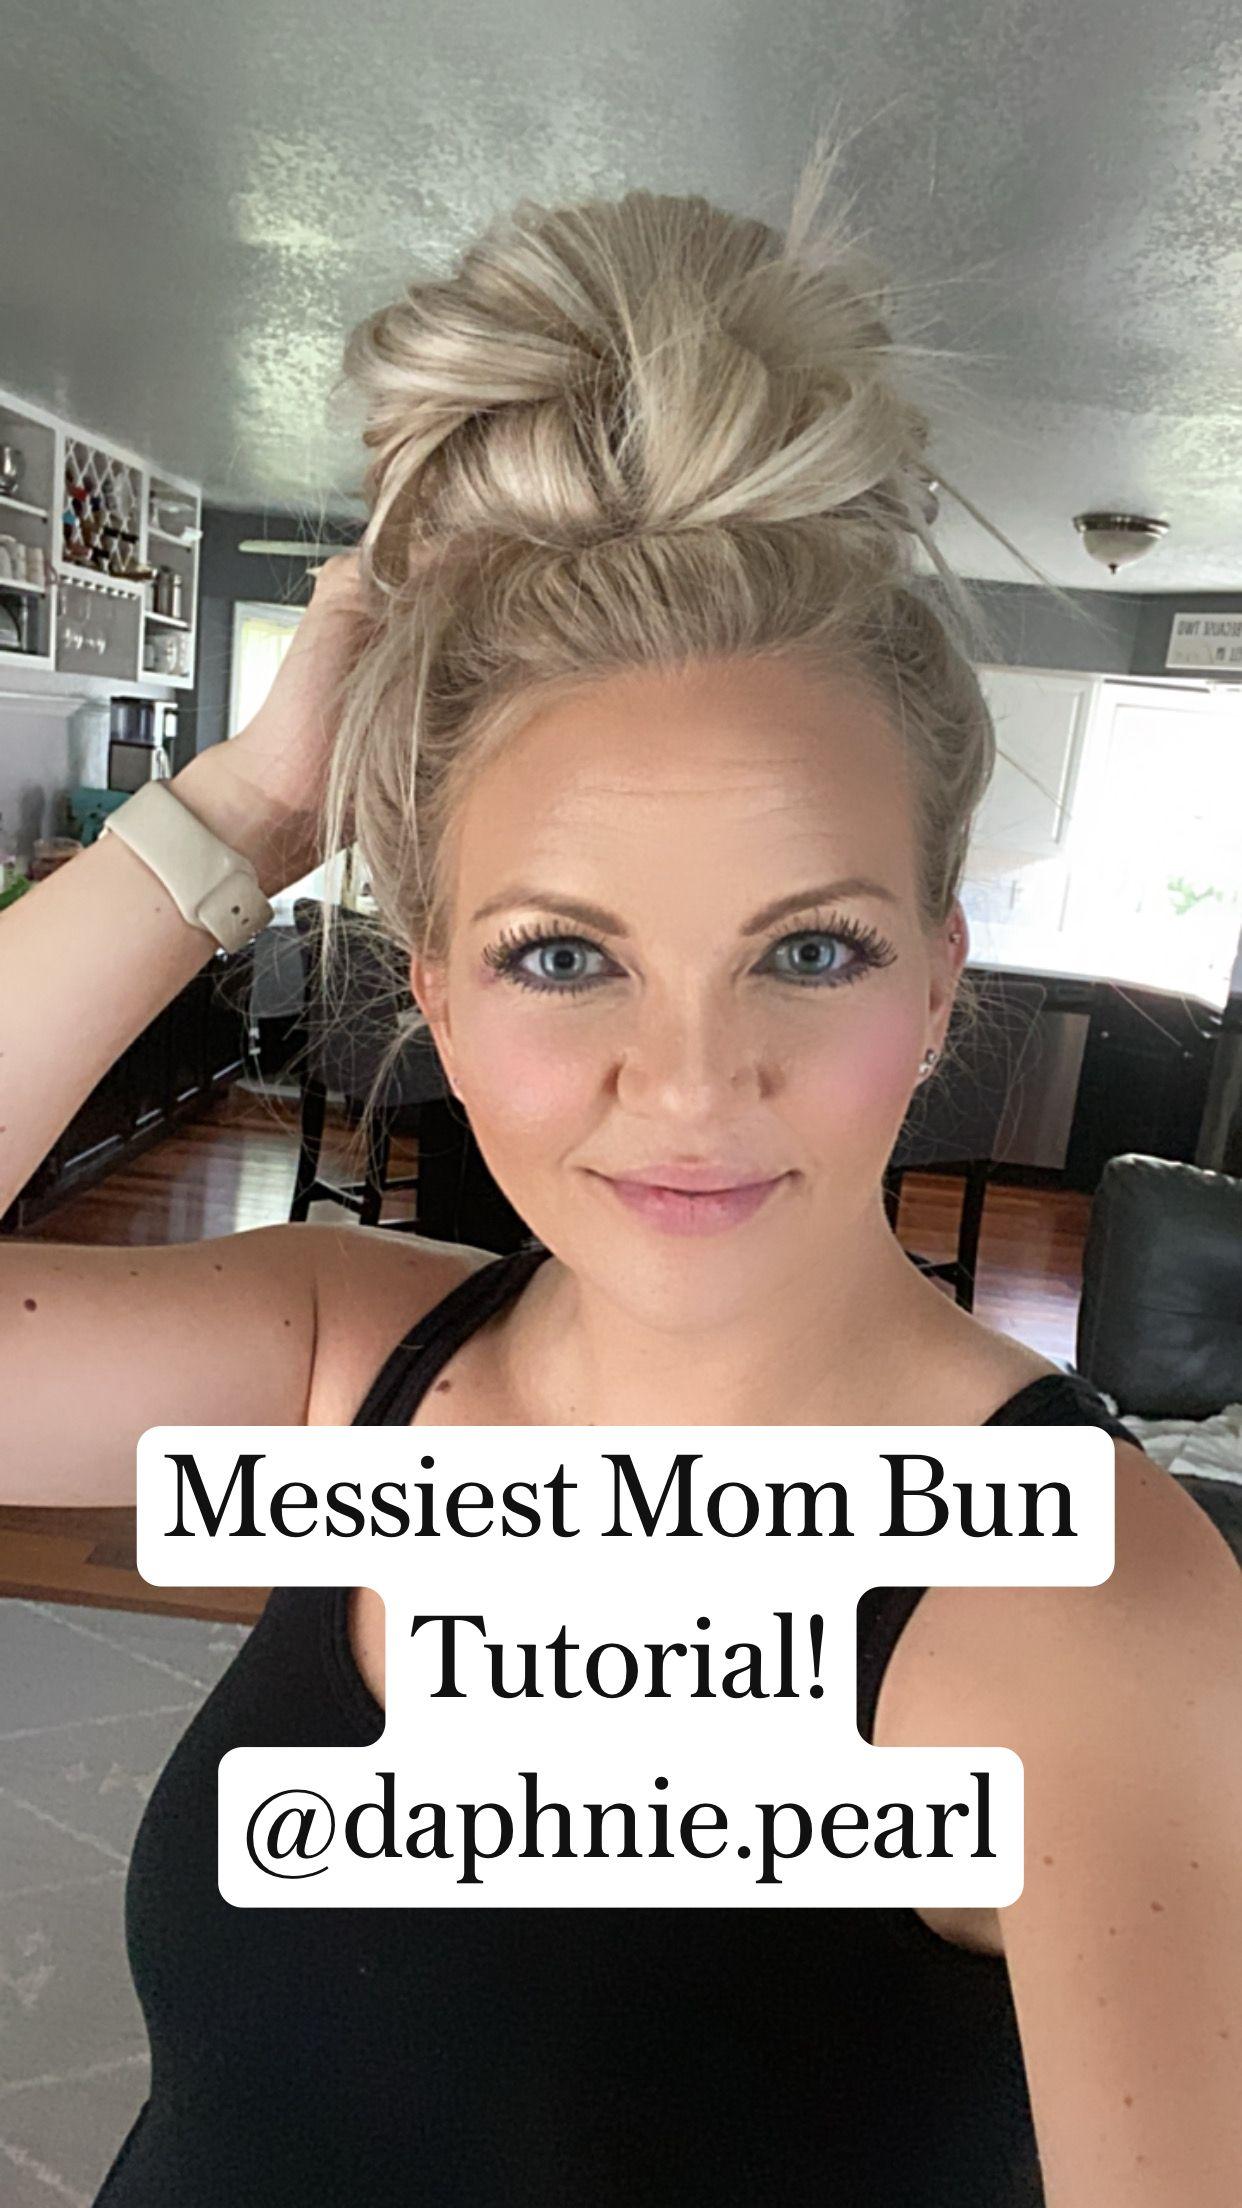 Messiest Mom Bun Tutorial! @daphnie.pearl